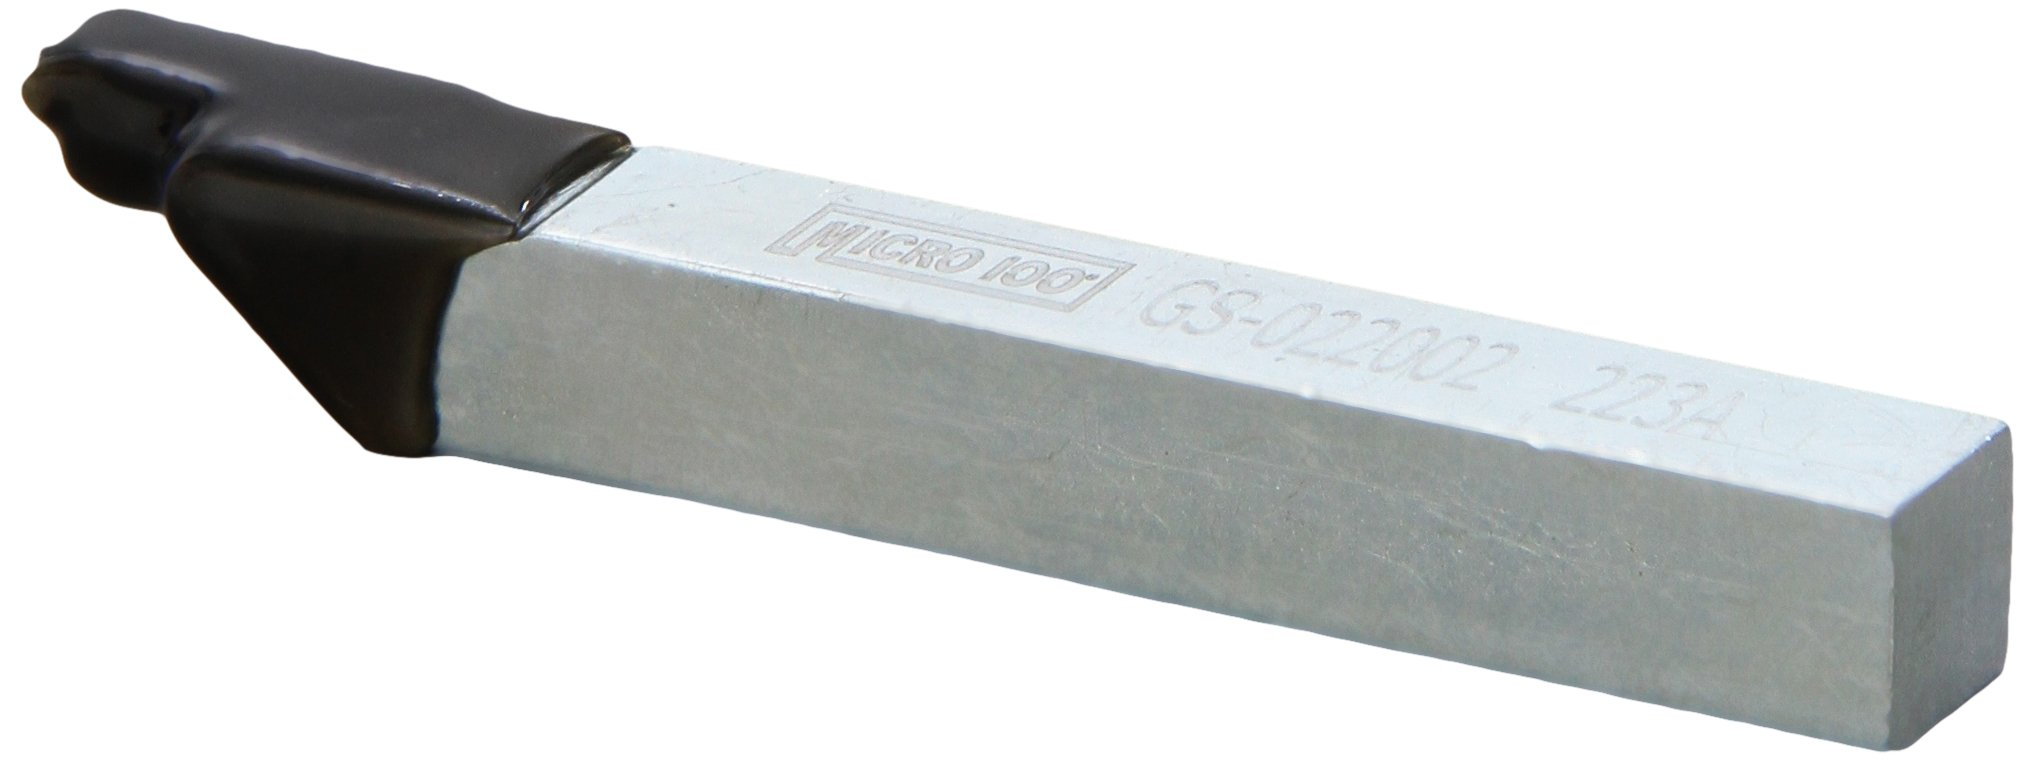 Micro 100 GS-022002 Brazed Groove Tool Square Shank Diameter ''Style GS'', 3'' Length, 3/8'' Width, 3/8'' Height, 0.022''/0.024'' Width, 0.090'' Length, 0.003'' maximum Radius